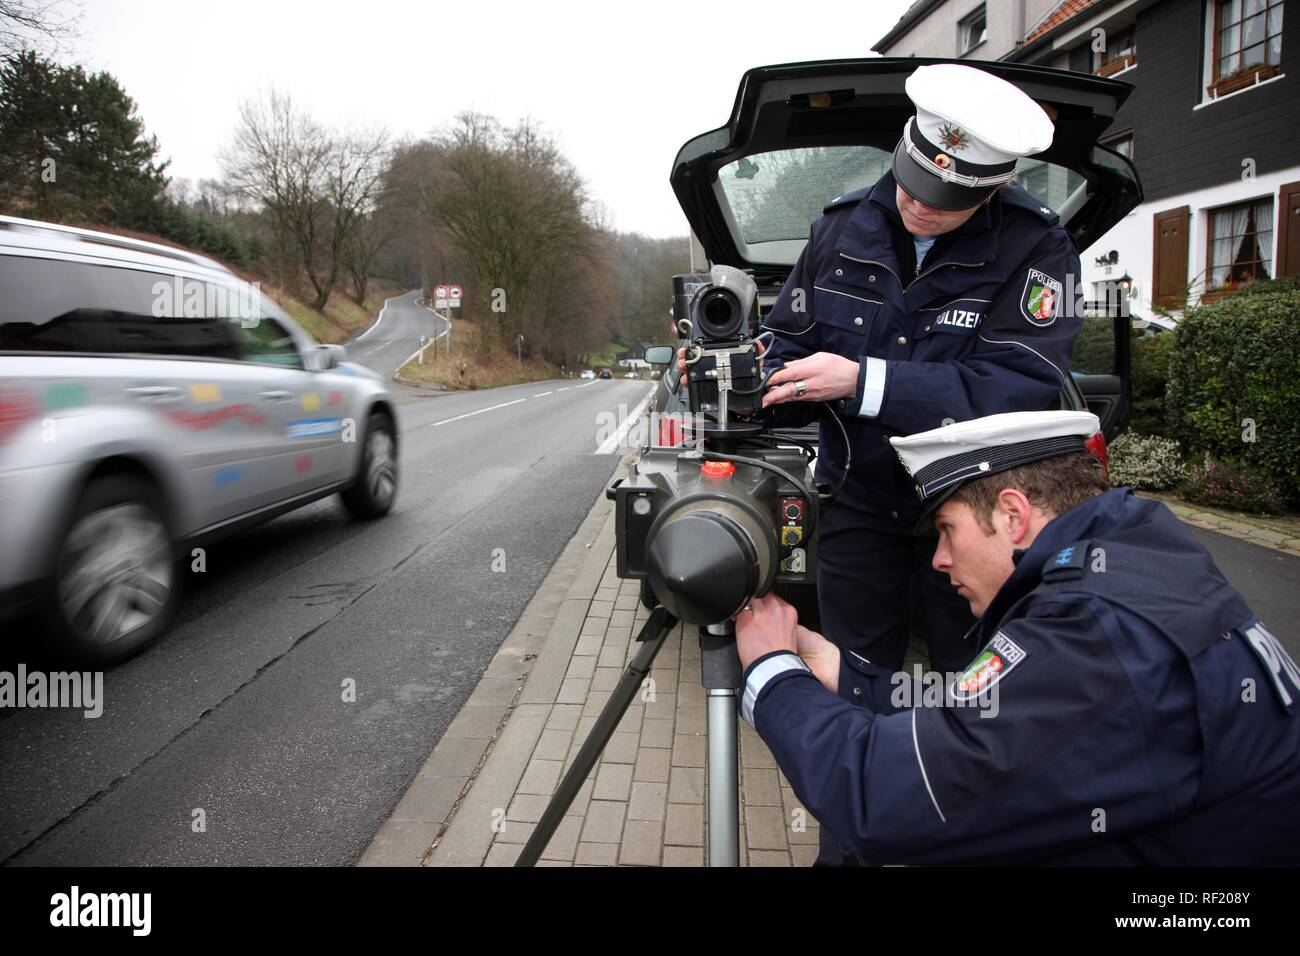 Police officers setting up radar speed check, Mettmann, North Rhine-Westphalia - Stock Image